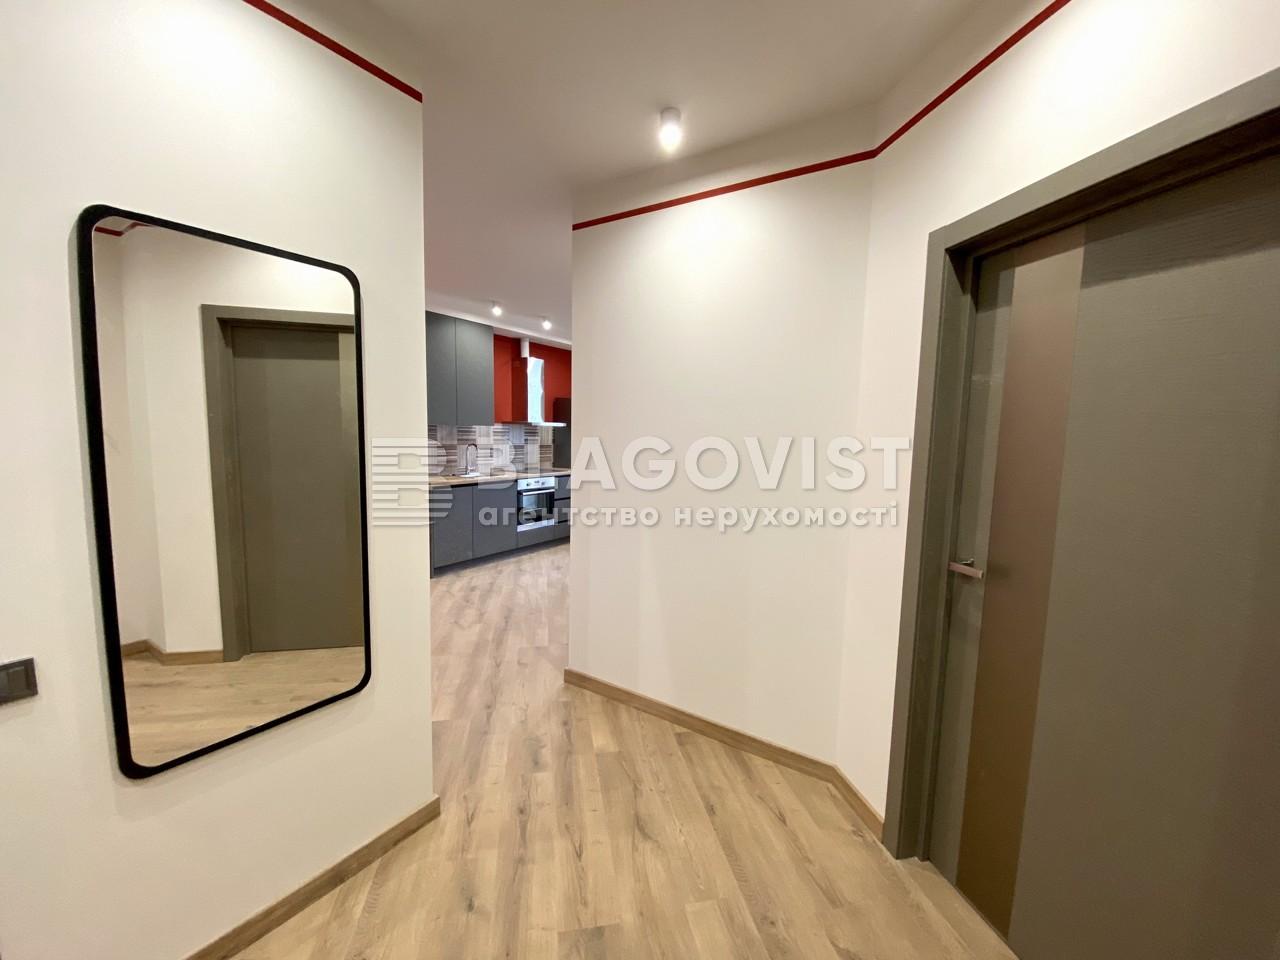 Квартира F-44937, Липкивского Василия (Урицкого), 37б, Киев - Фото 14